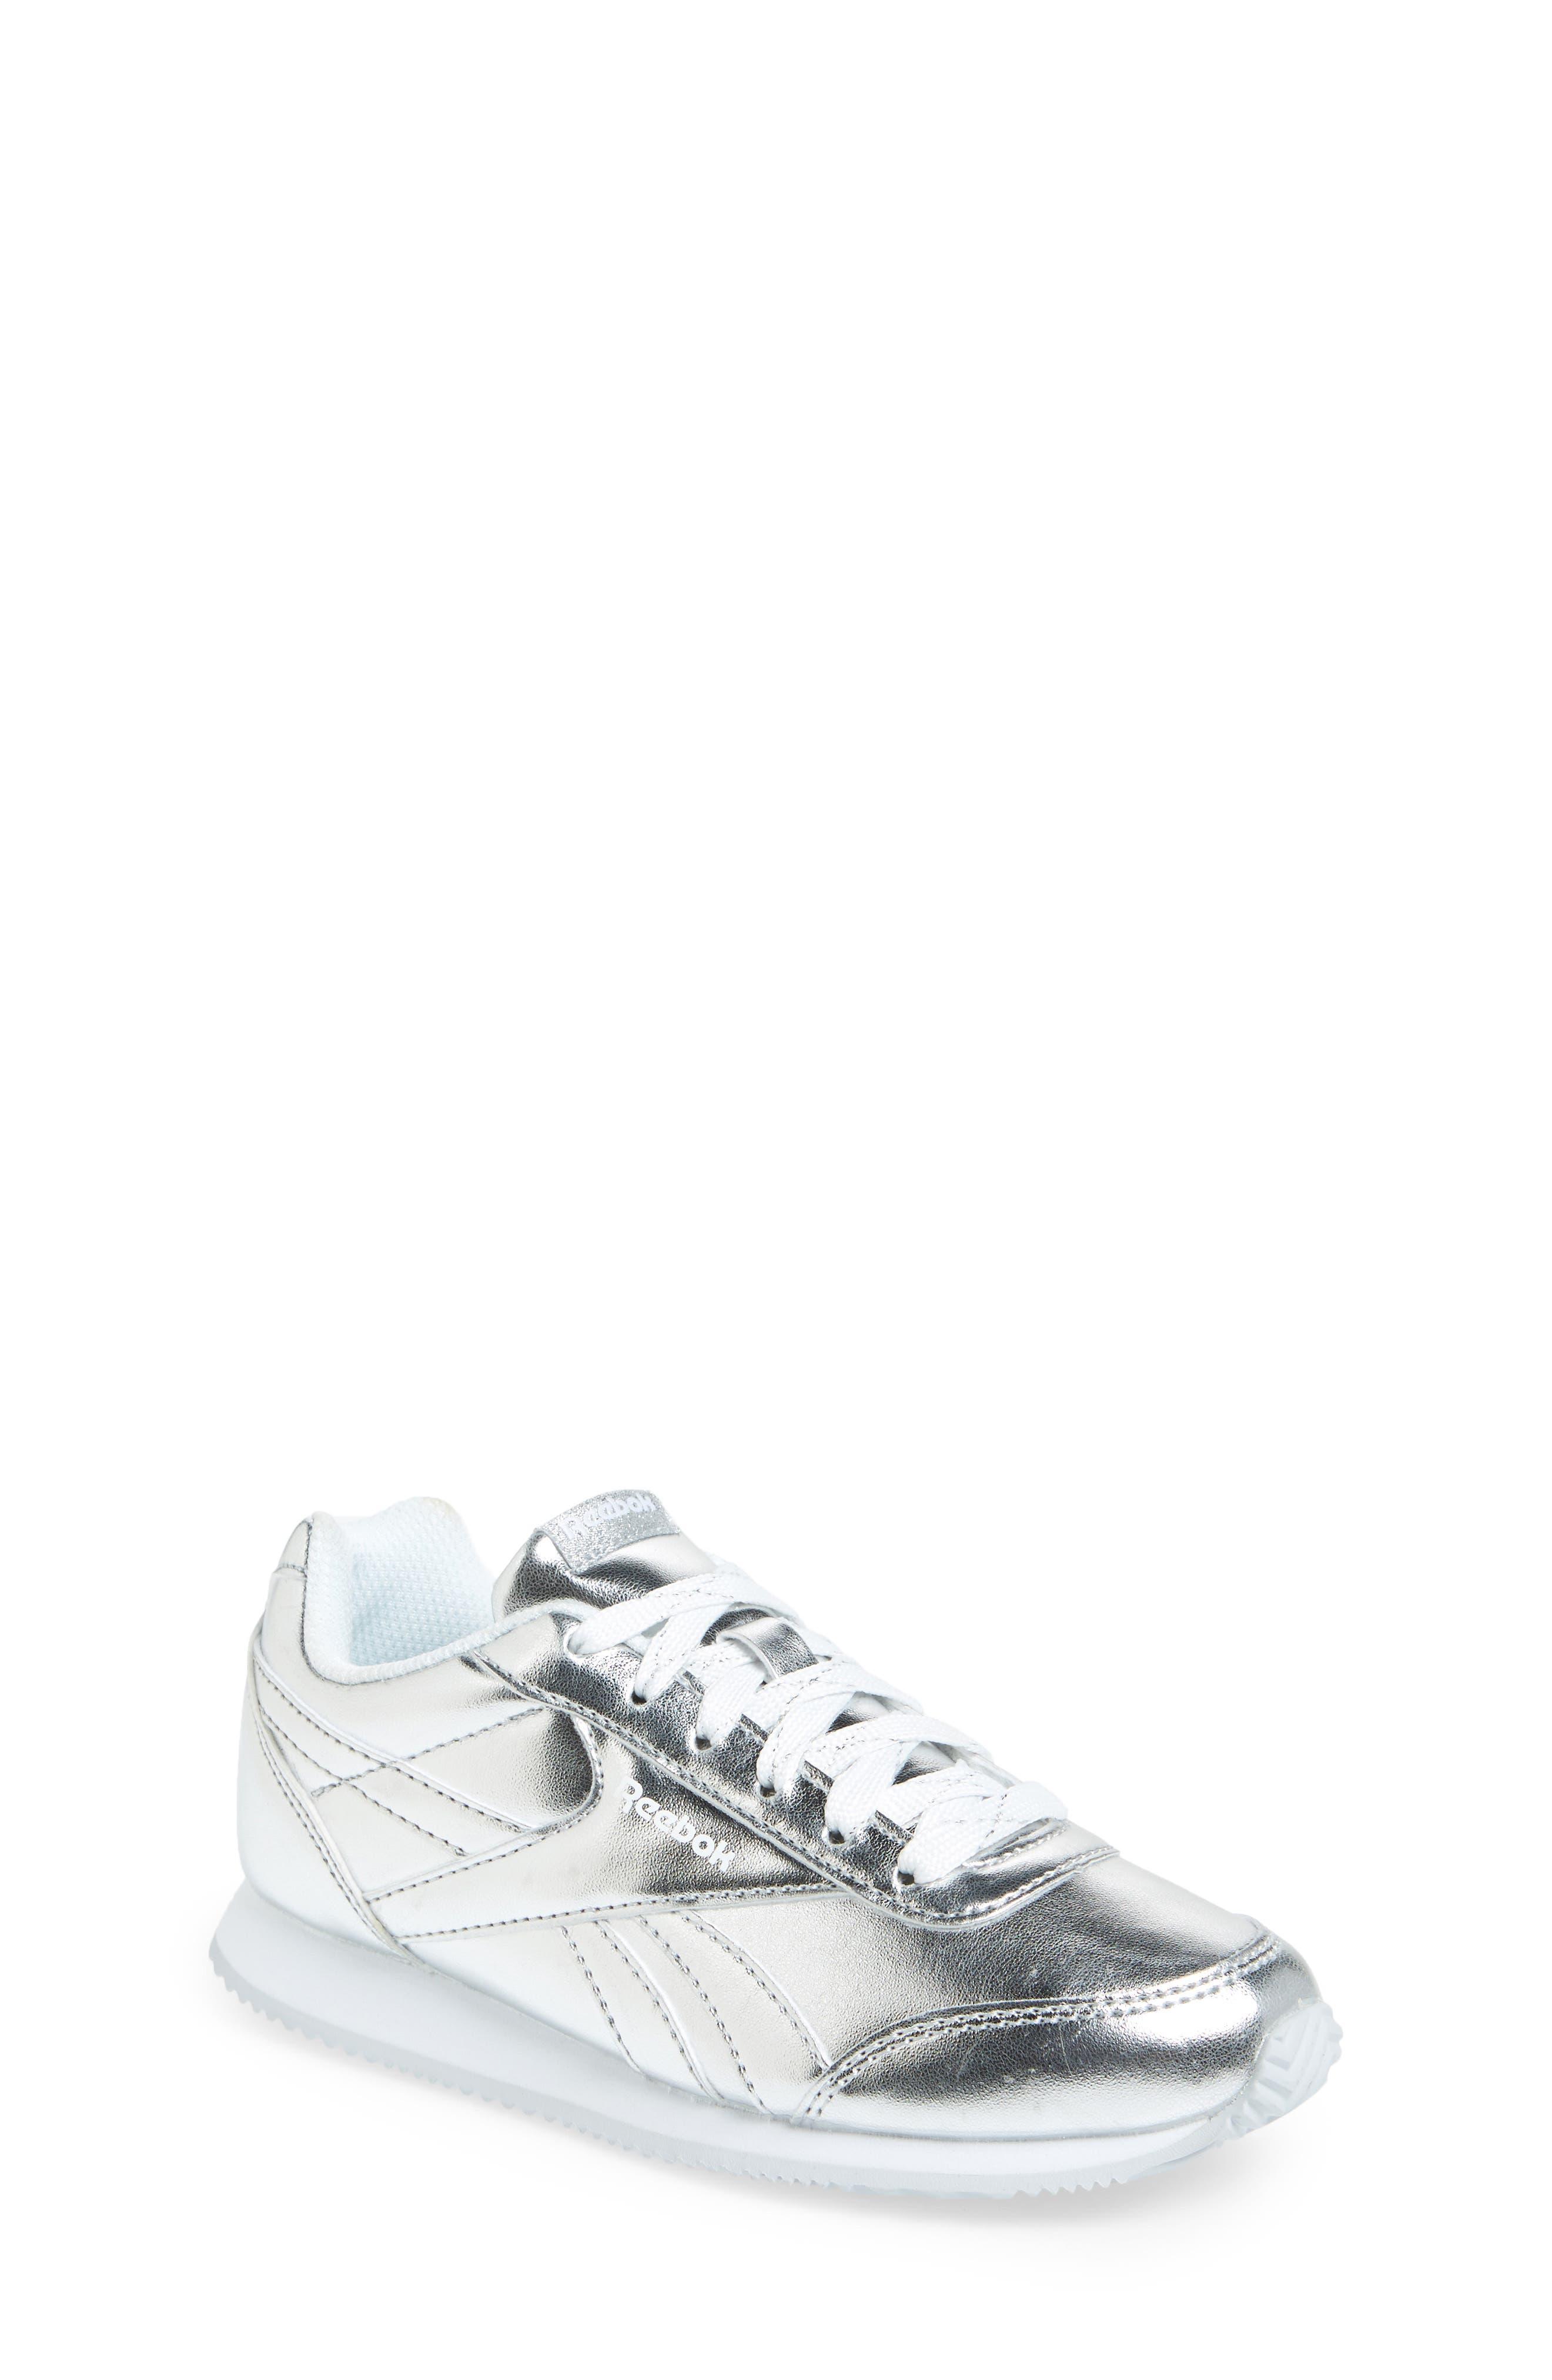 Royal Classic Jogger 2.0 Sneaker,                             Main thumbnail 1, color,                             040